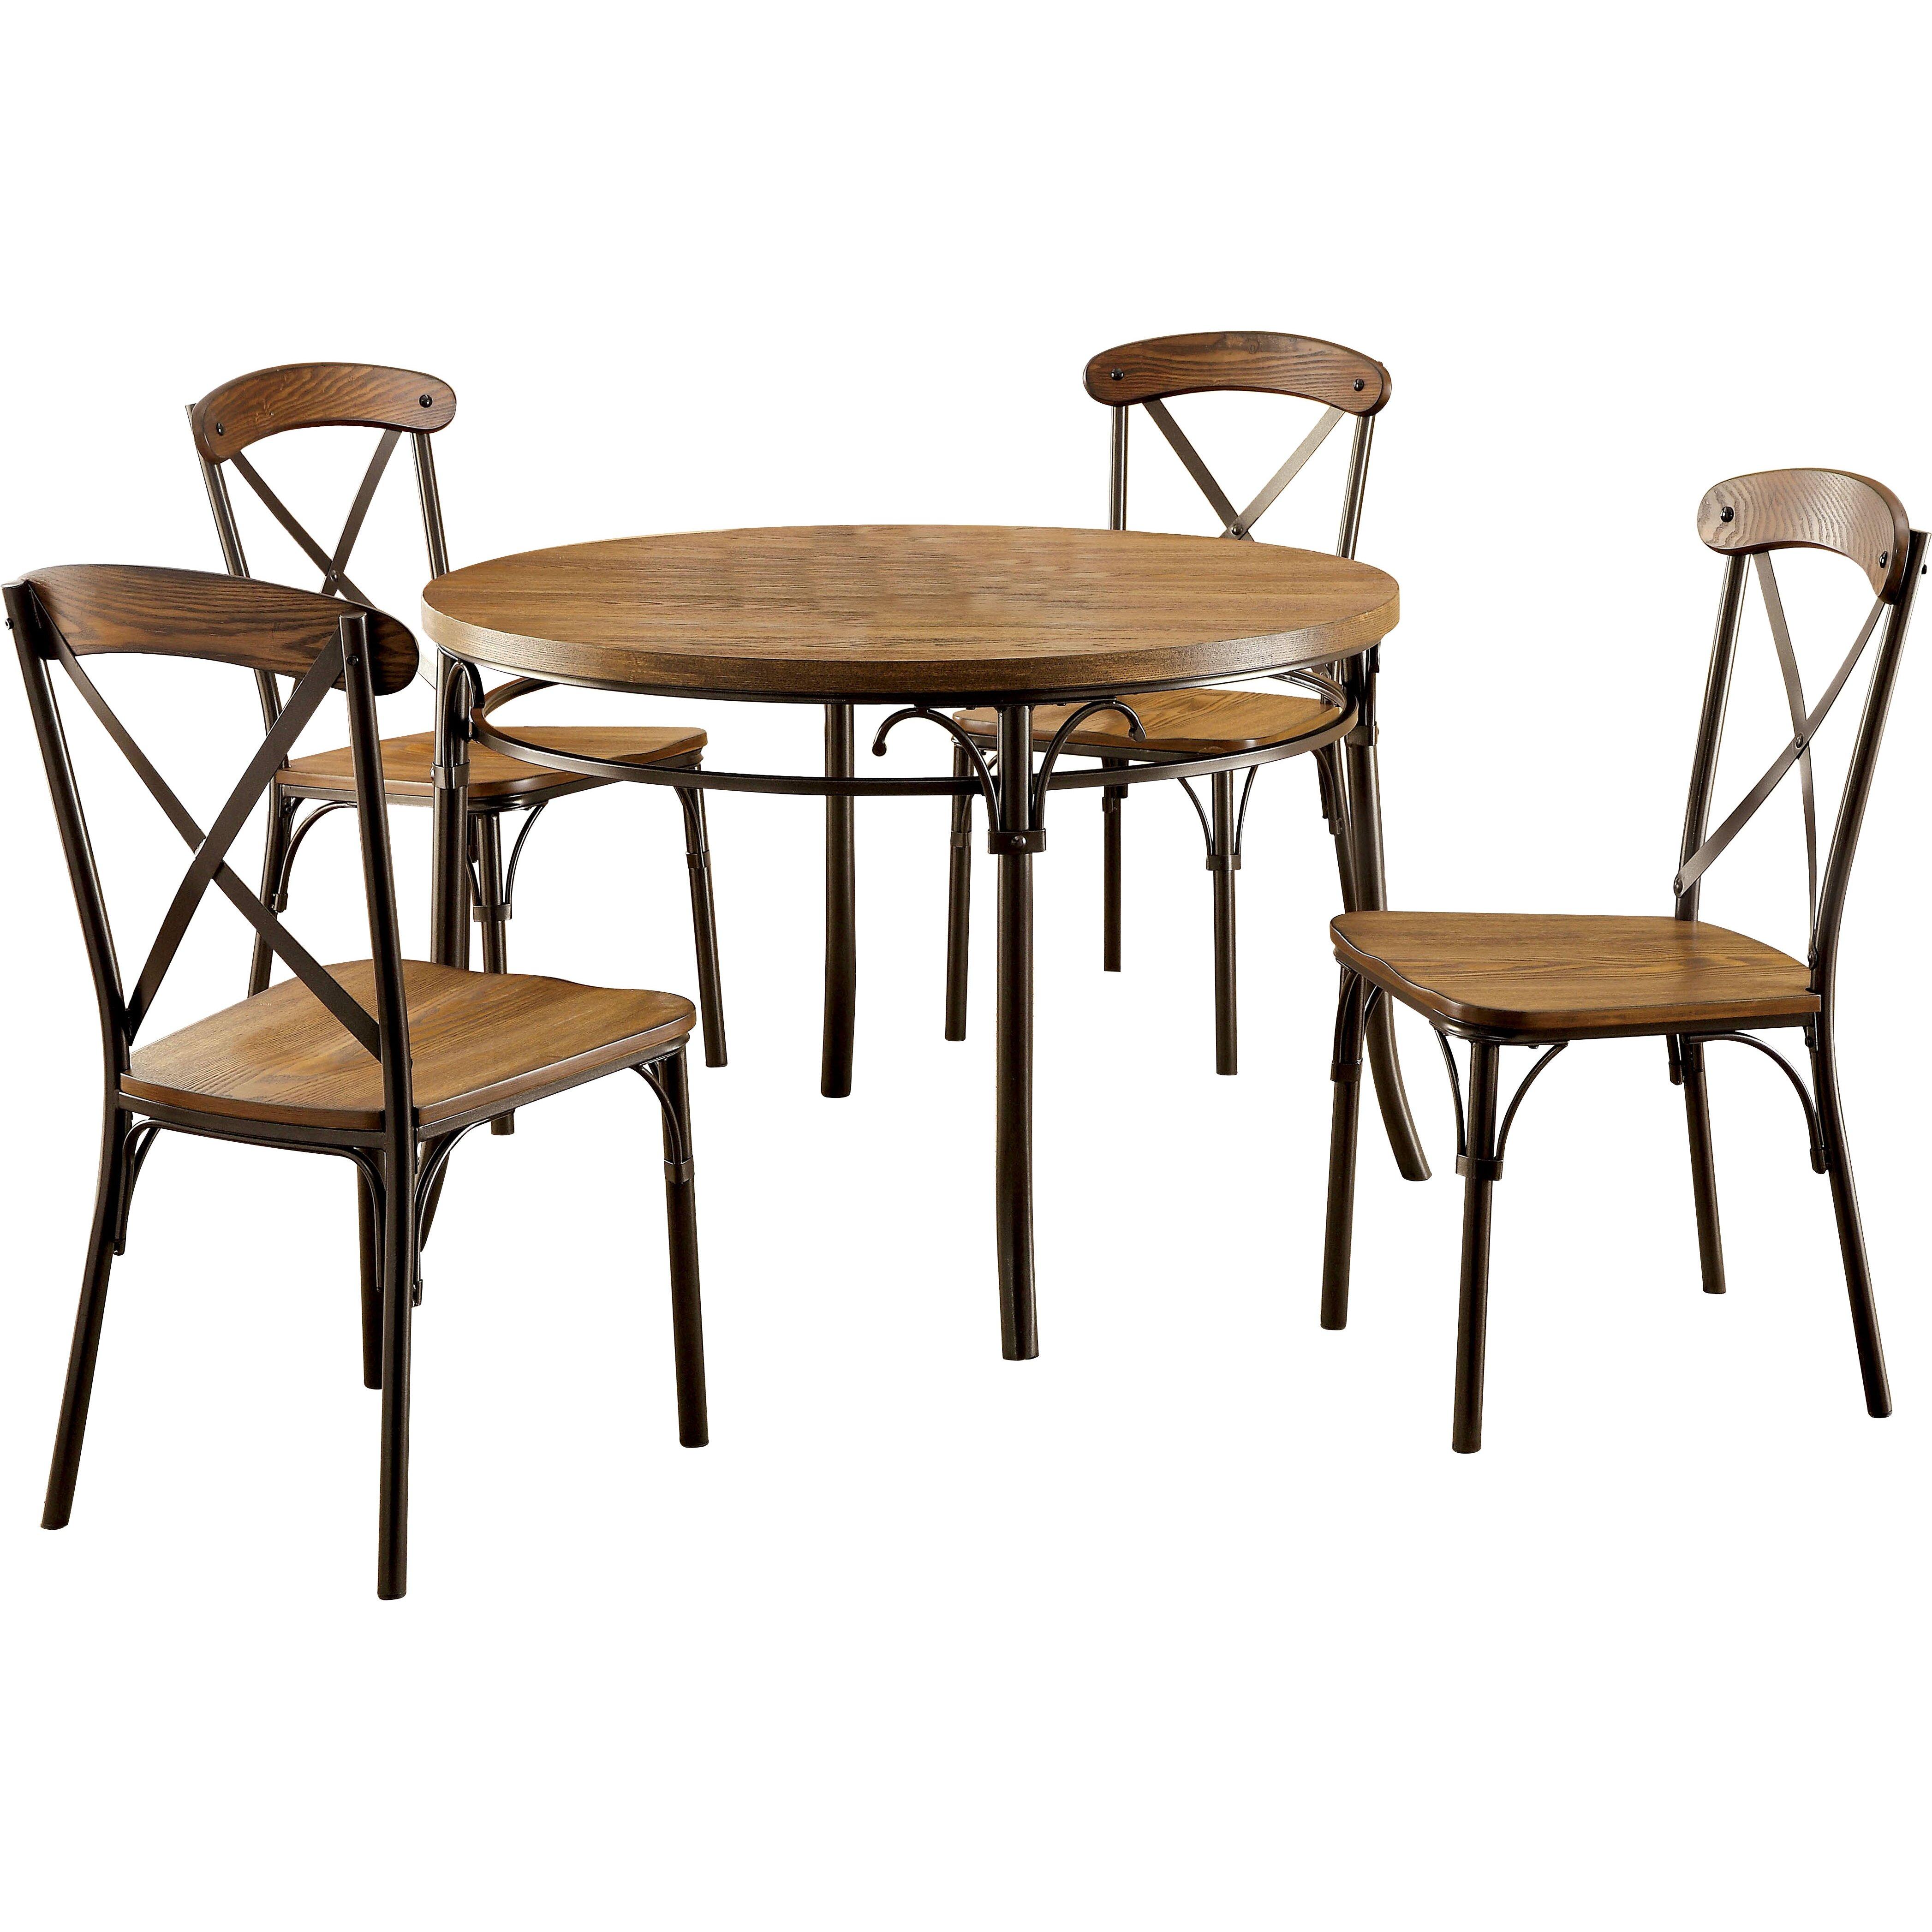 Hokku Designs Maya Round Dining Table amp Reviews Wayfair  : Hokku Designs Maya Round Dining Table from www.wayfairsupply.com size 4188 x 4188 jpeg 1466kB